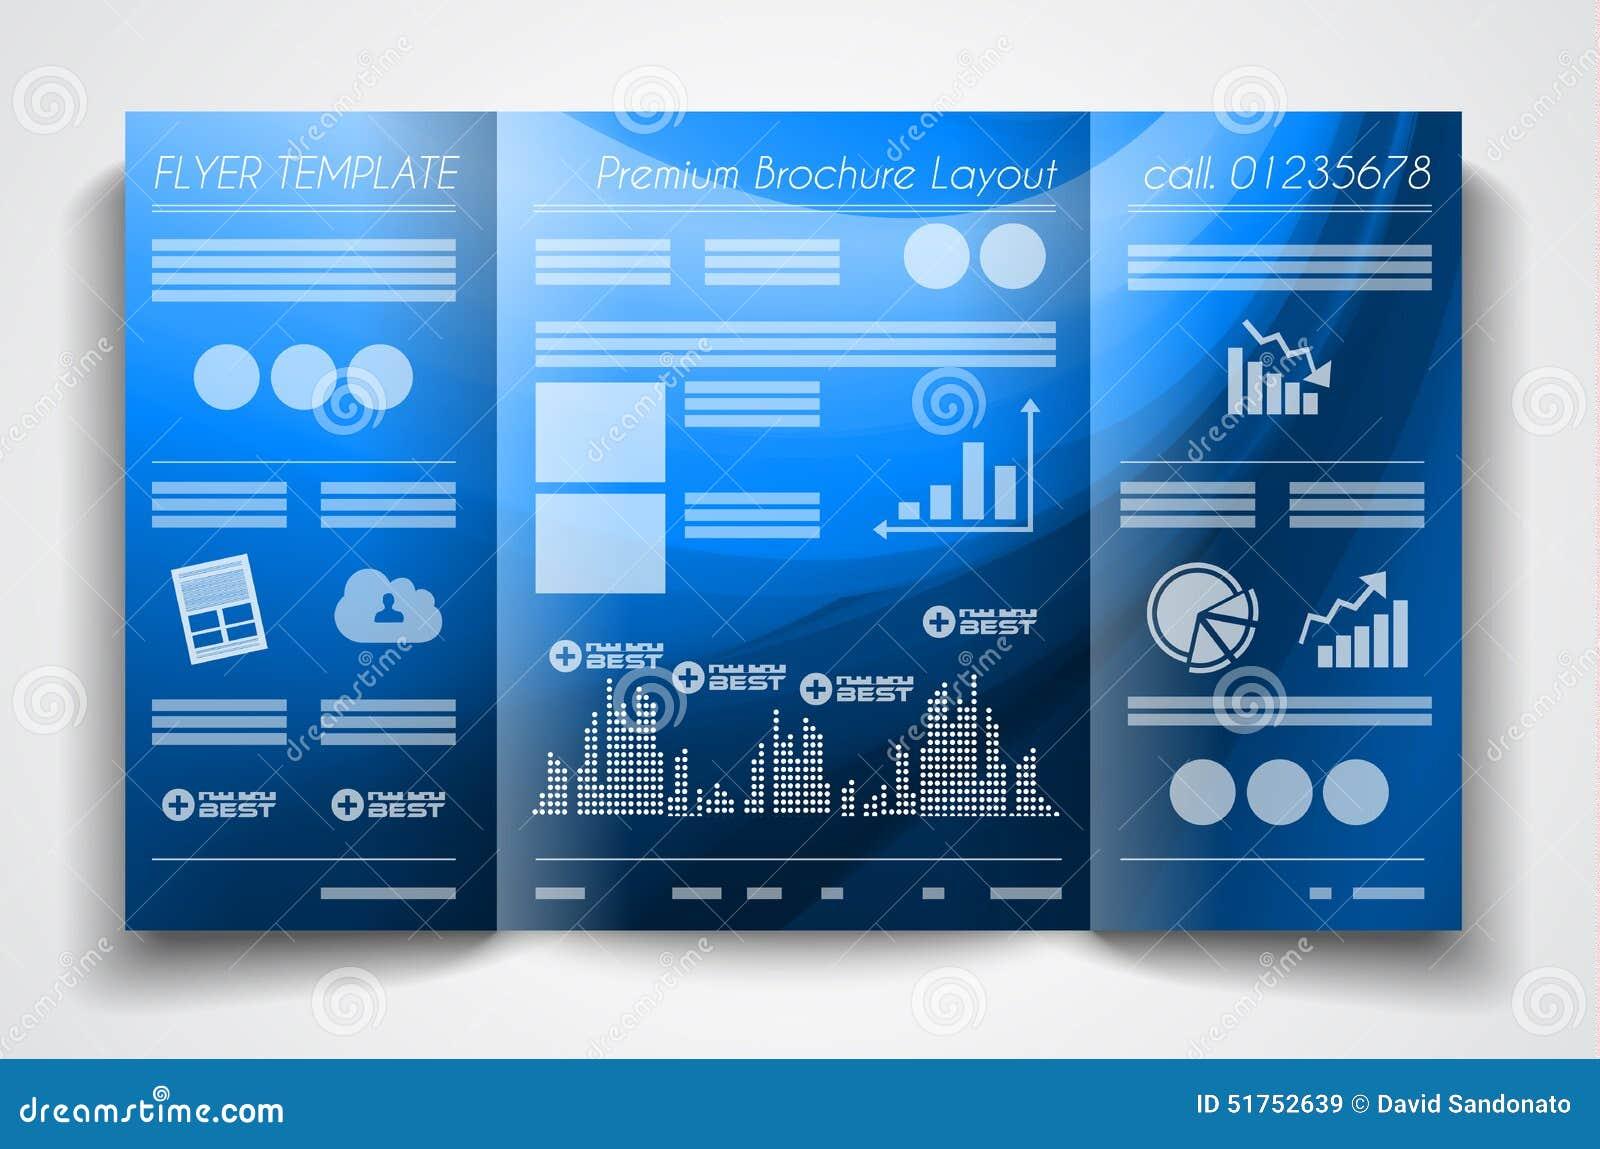 Vector Tri Fold Brochure Template Design Or Flyer Layout – Free Printable Tri Fold Brochure Templates